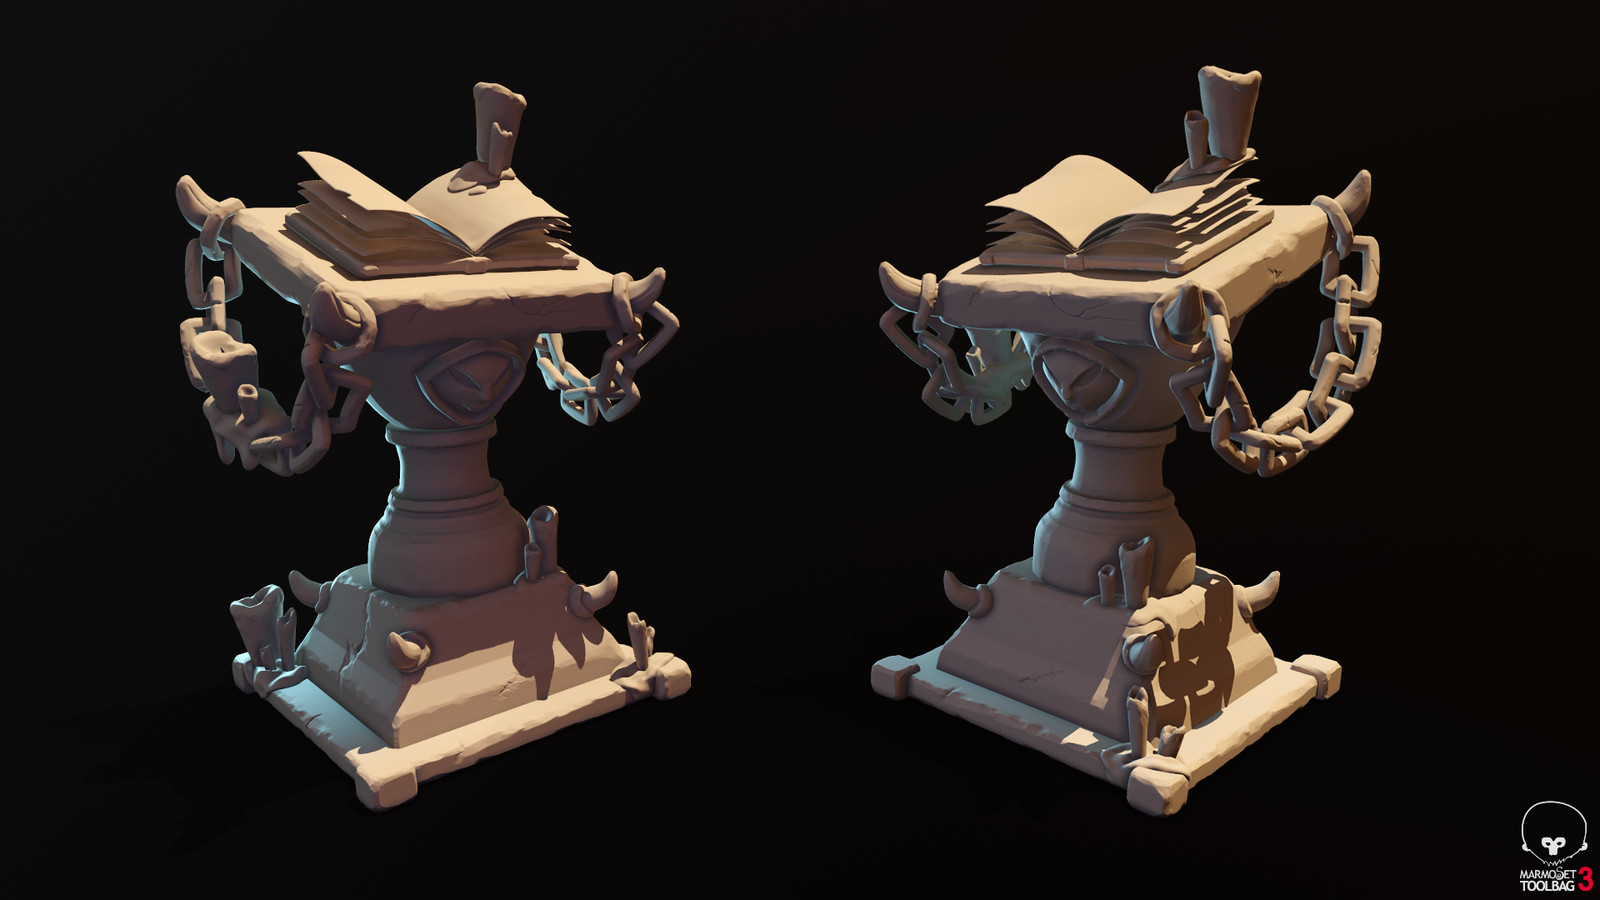 Stylized Sculpts